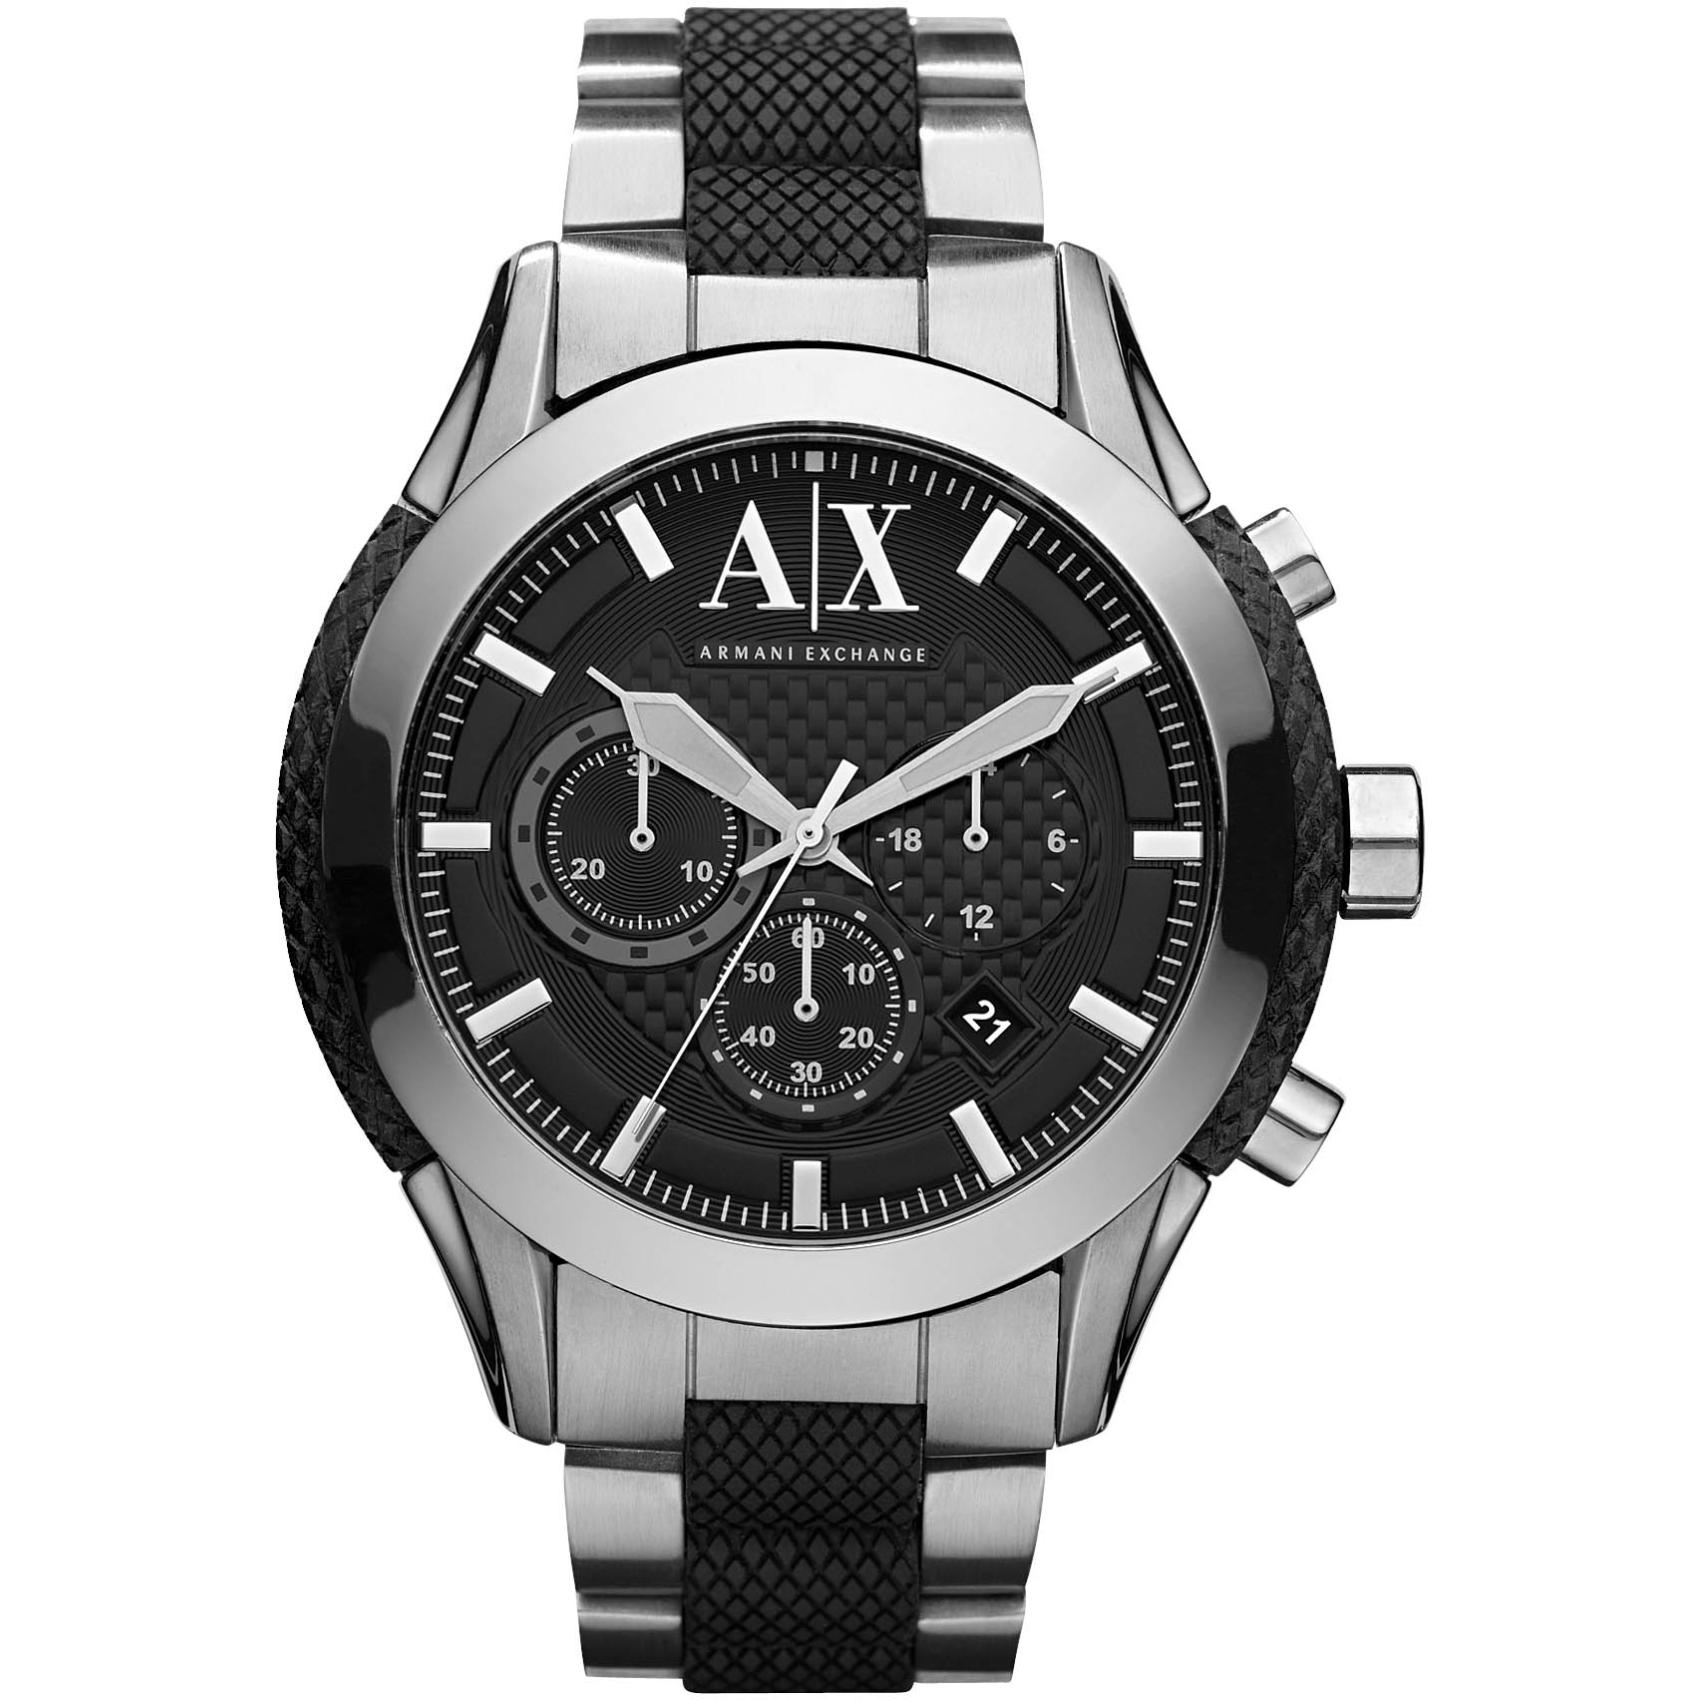 2a625948 Gents Armani Exchange Chronograph Watch (AX1214) | WatchShop.com™